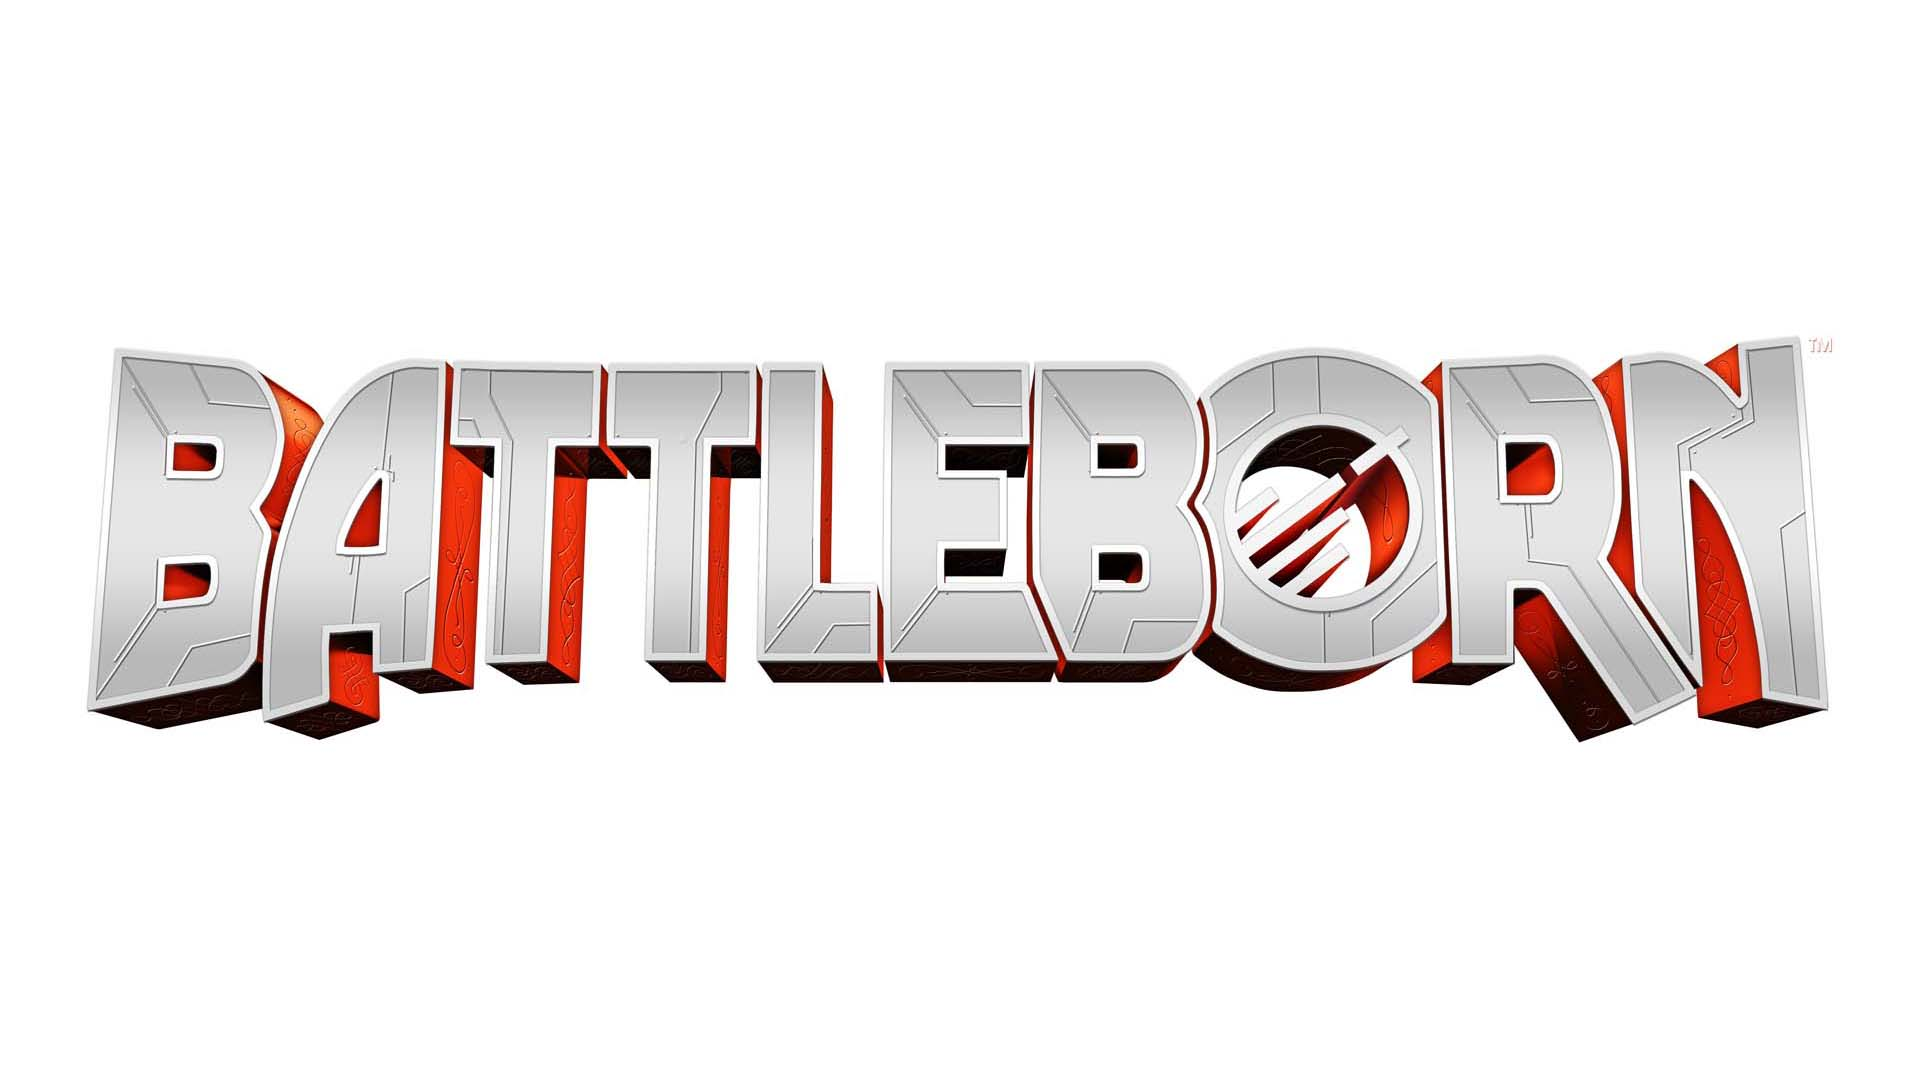 Battleborns vierte Story-Operation ab heute verfügbar und fünfte Story-Operation enthüllt